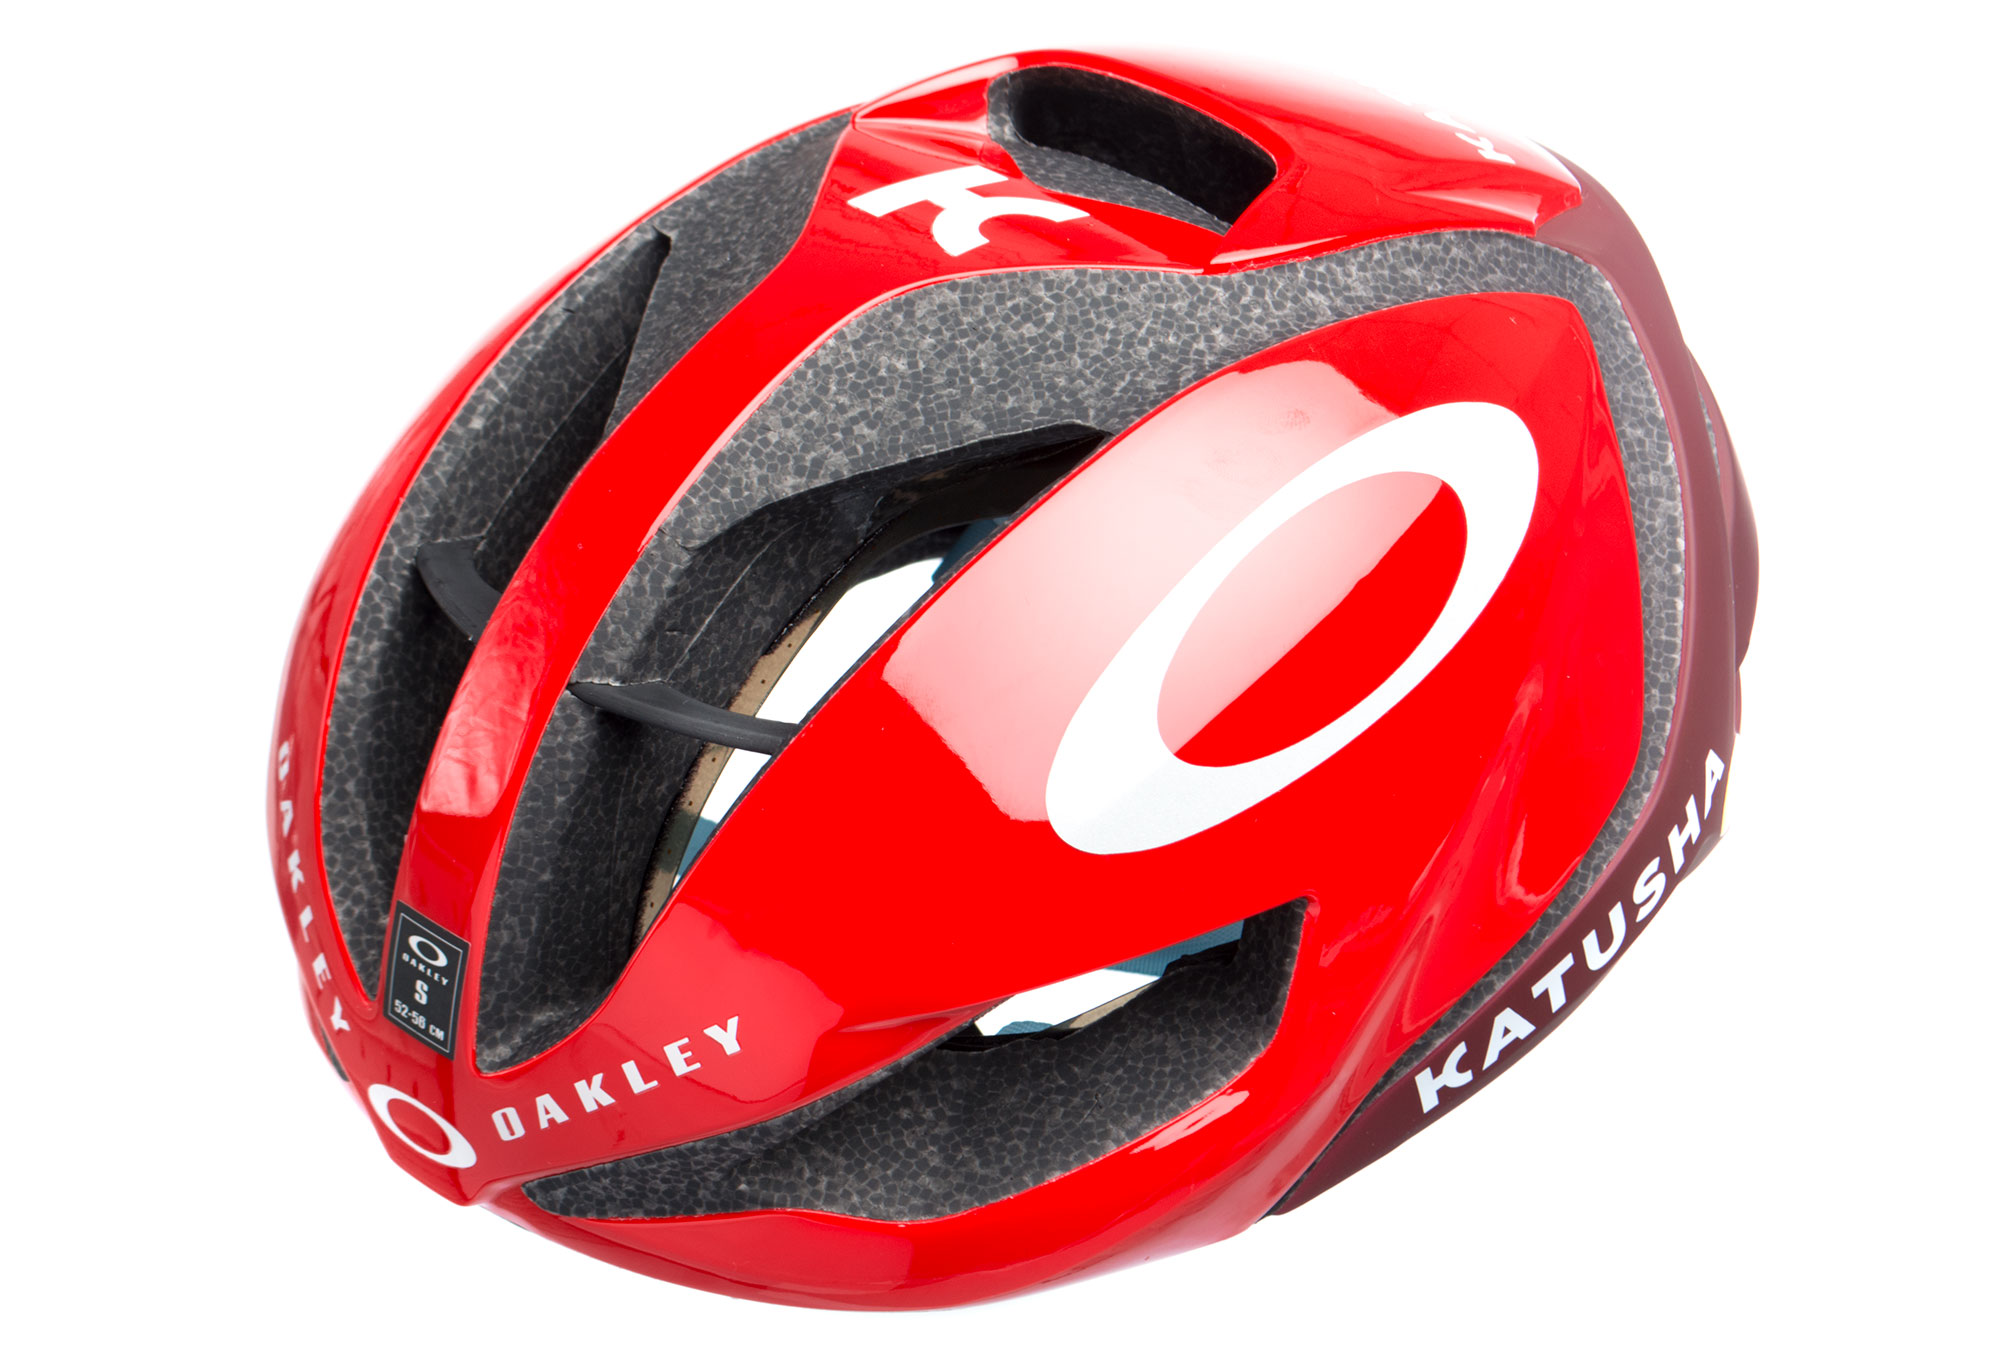 62a7338825 Oakley Helmet ARO5 Mips Team Katusha Alpecin Rouge